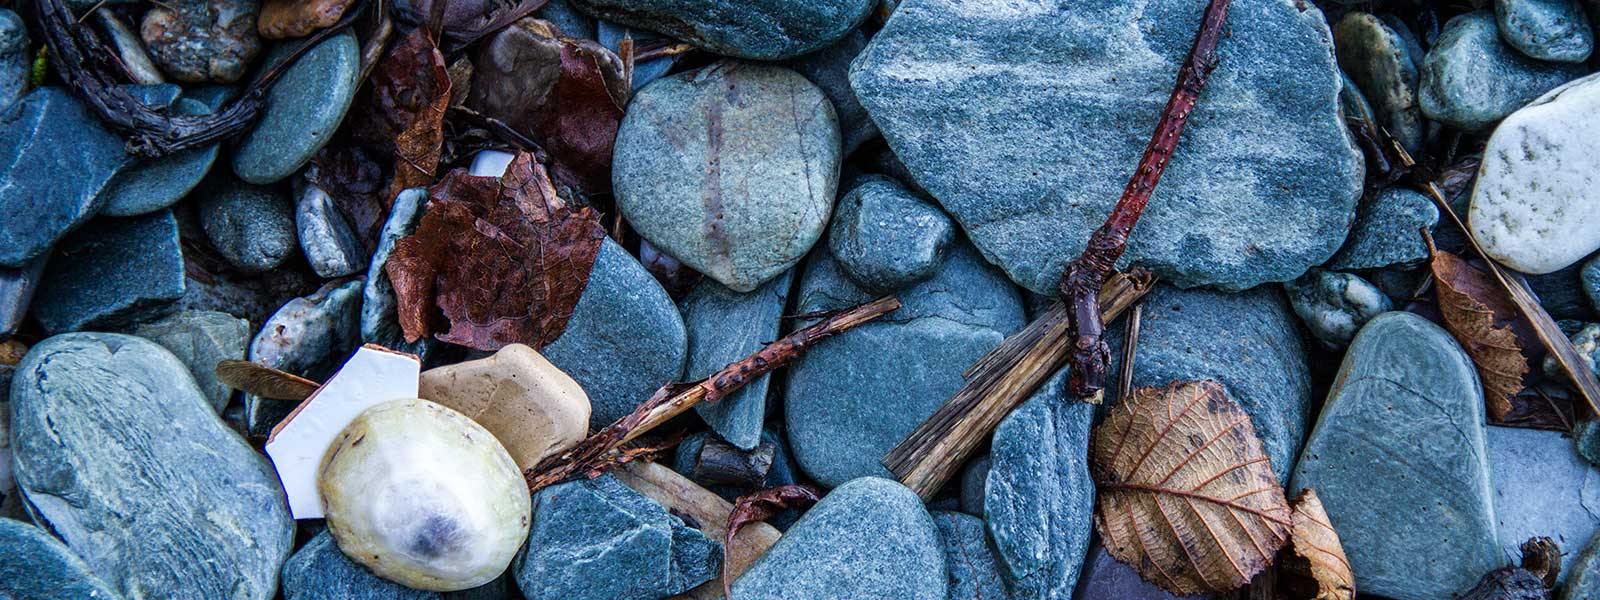 west-coast-media-beach-shell-pebbles